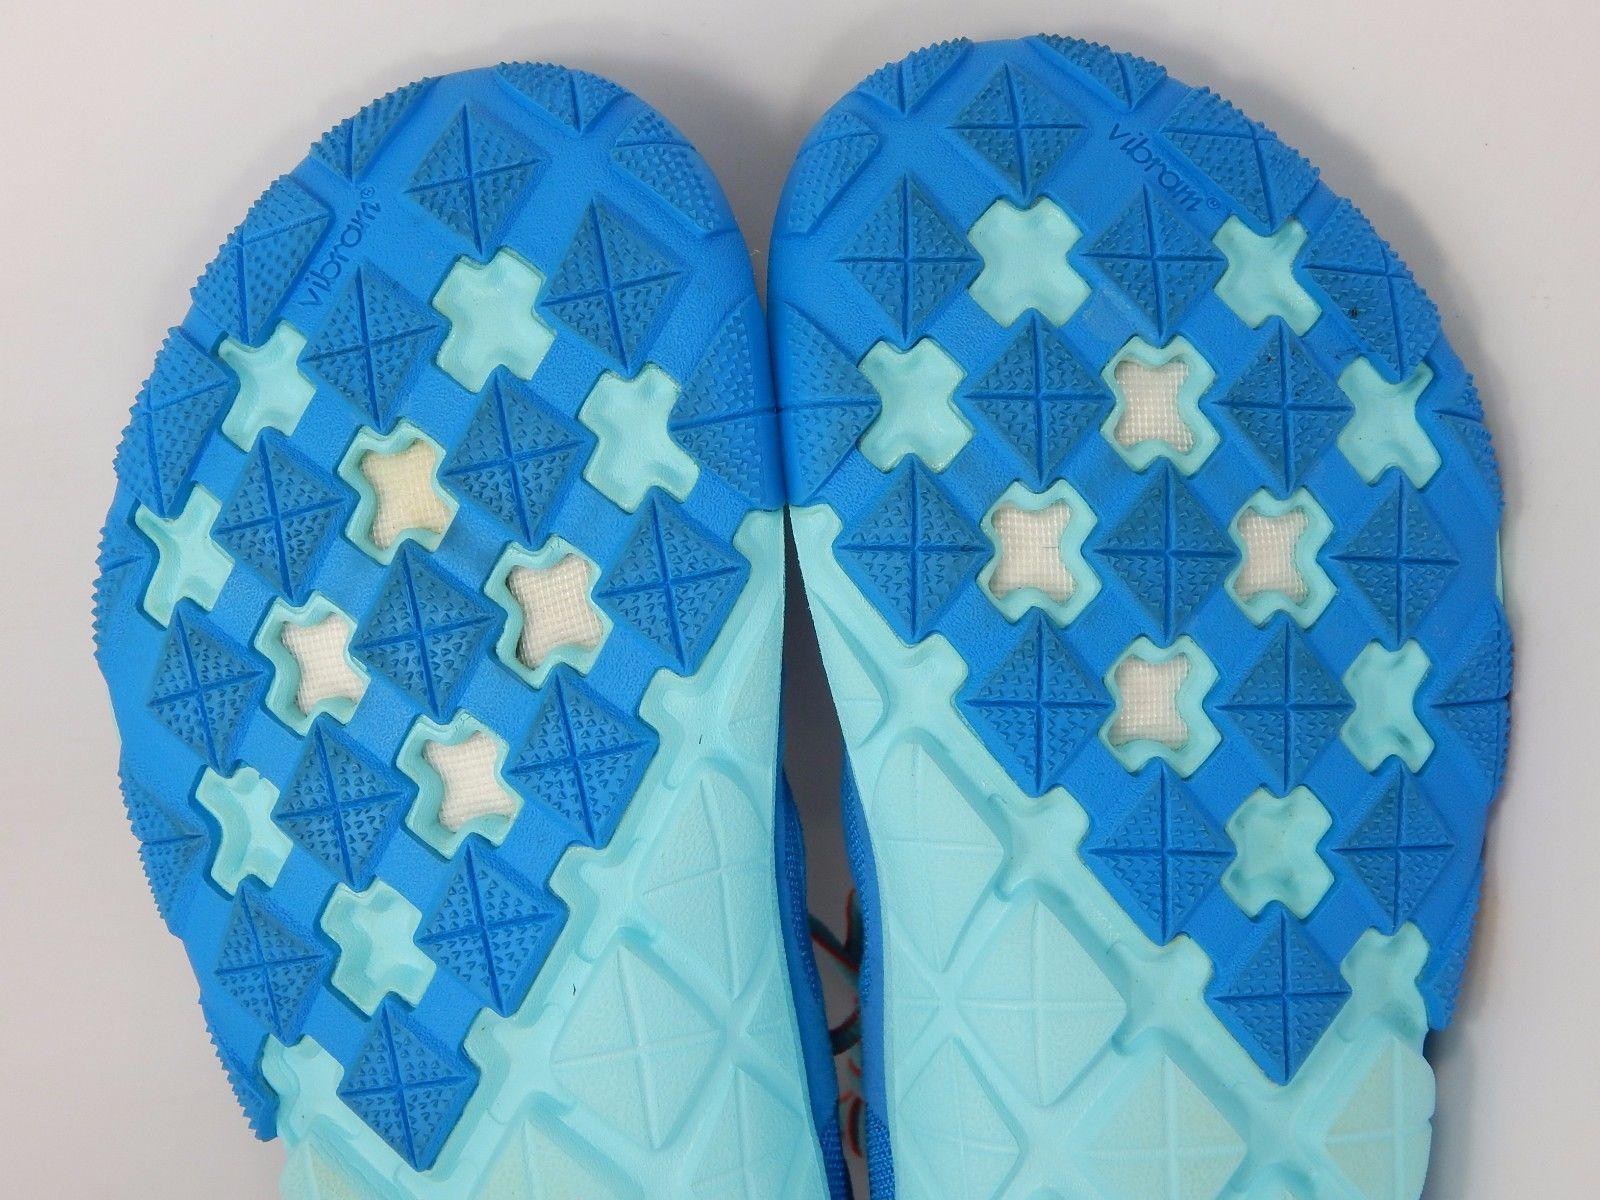 New Balance Minimus 20 Women's Running Shoes Sz US 10 M (B) EU 41.5 Blue WR20BB1